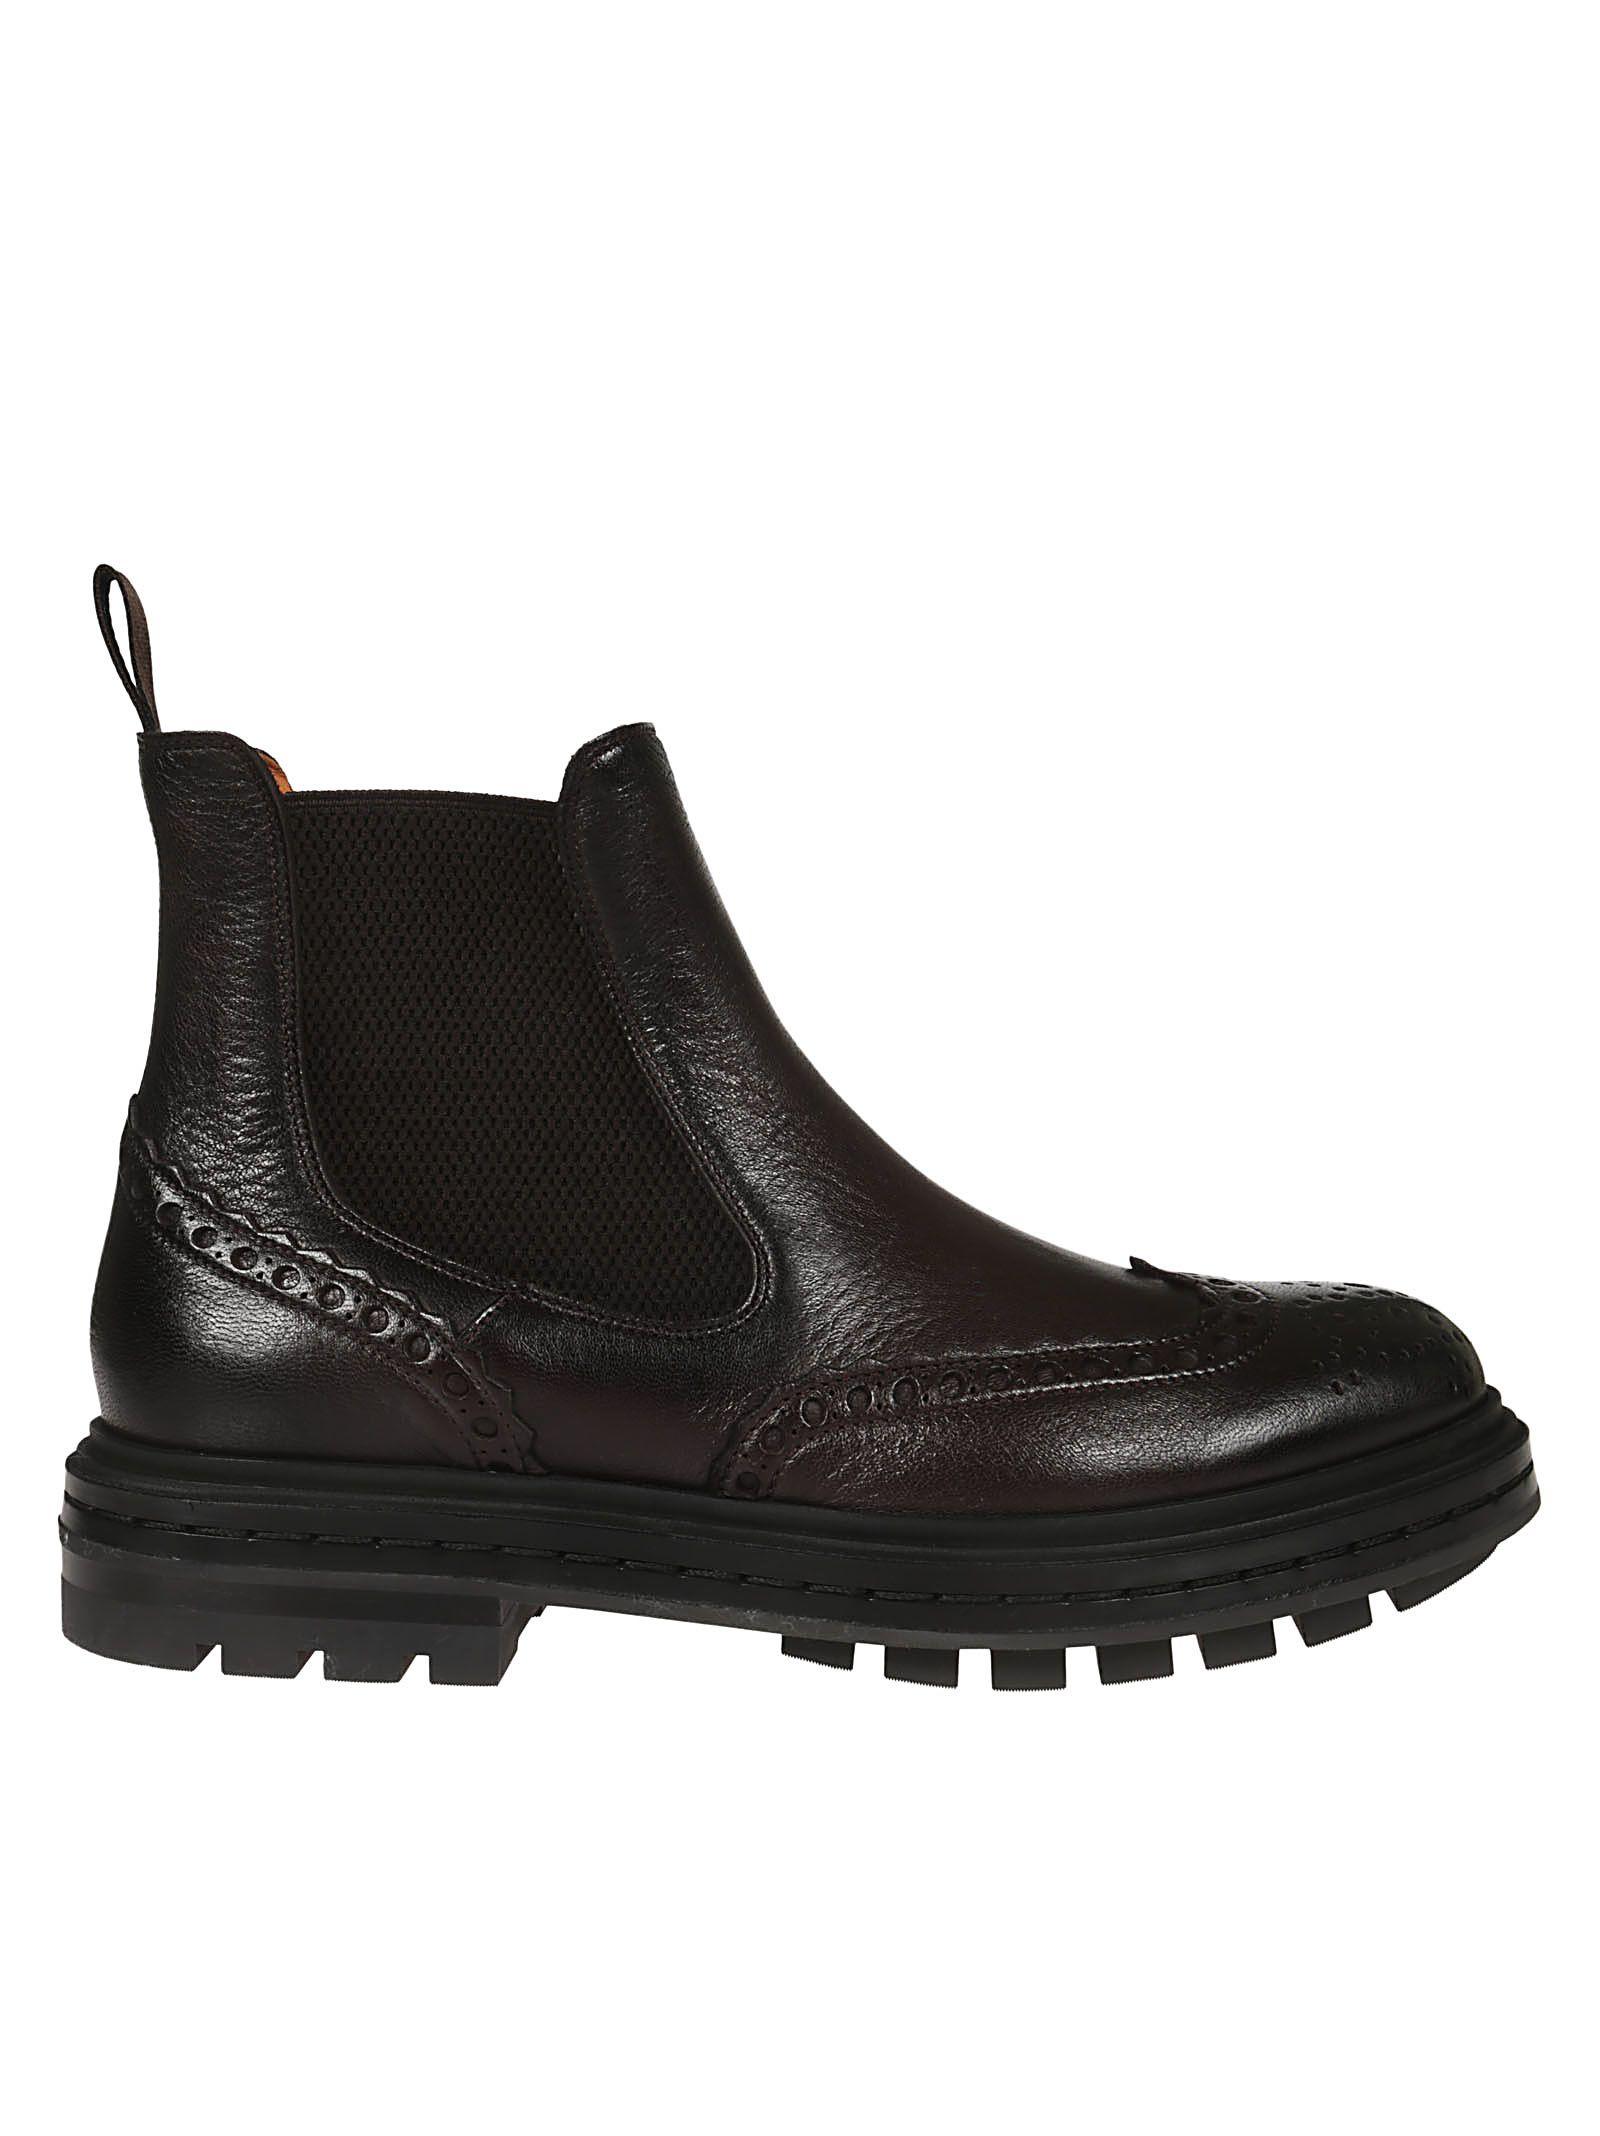 Santoni Brogues Ankle Boots